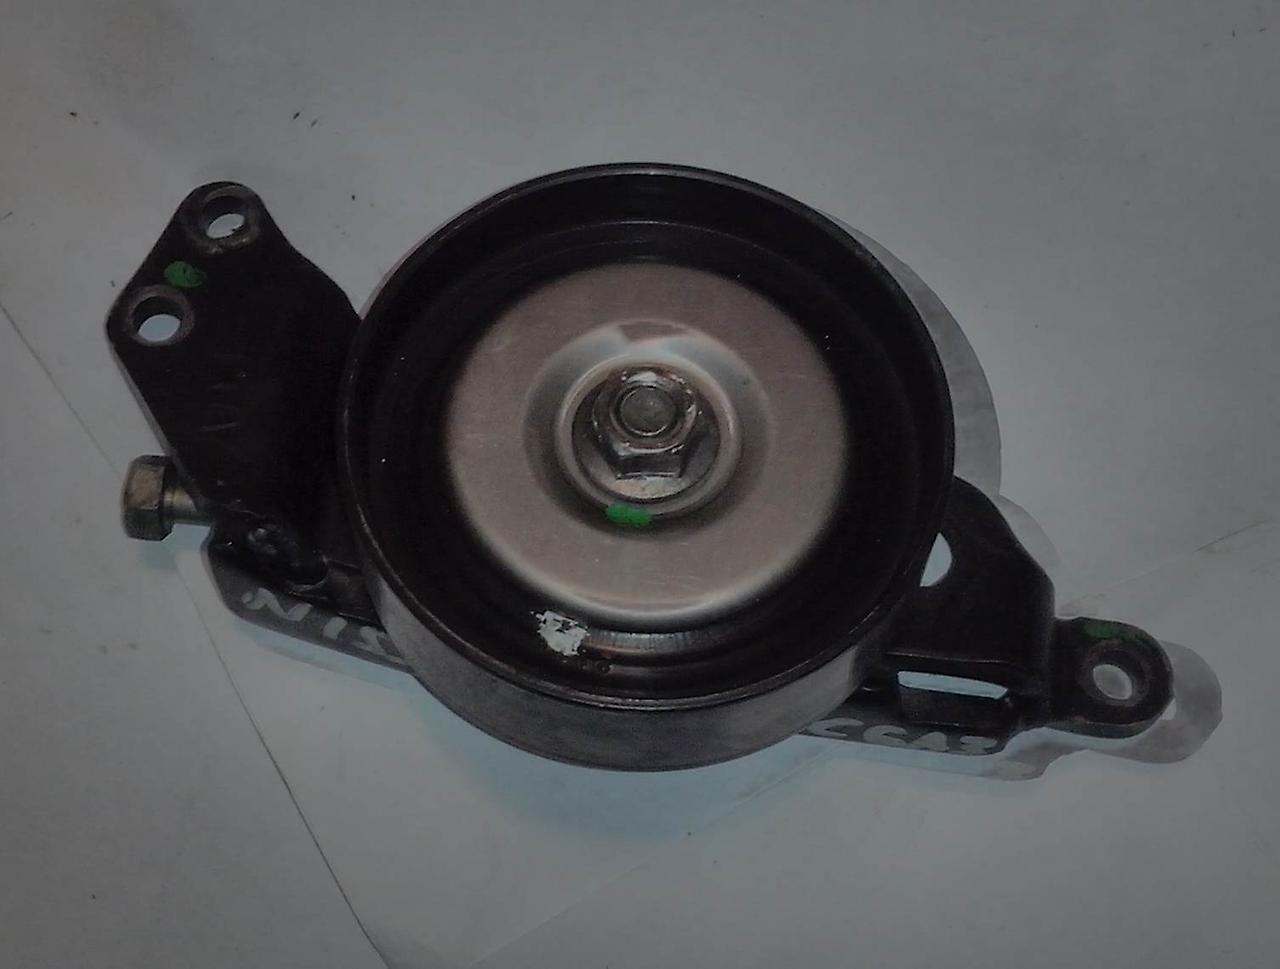 ACP65992                                  - ALMERA 00-,PRIMERA 96-02                                  - A/C Compressor Pulley                                 ....165580